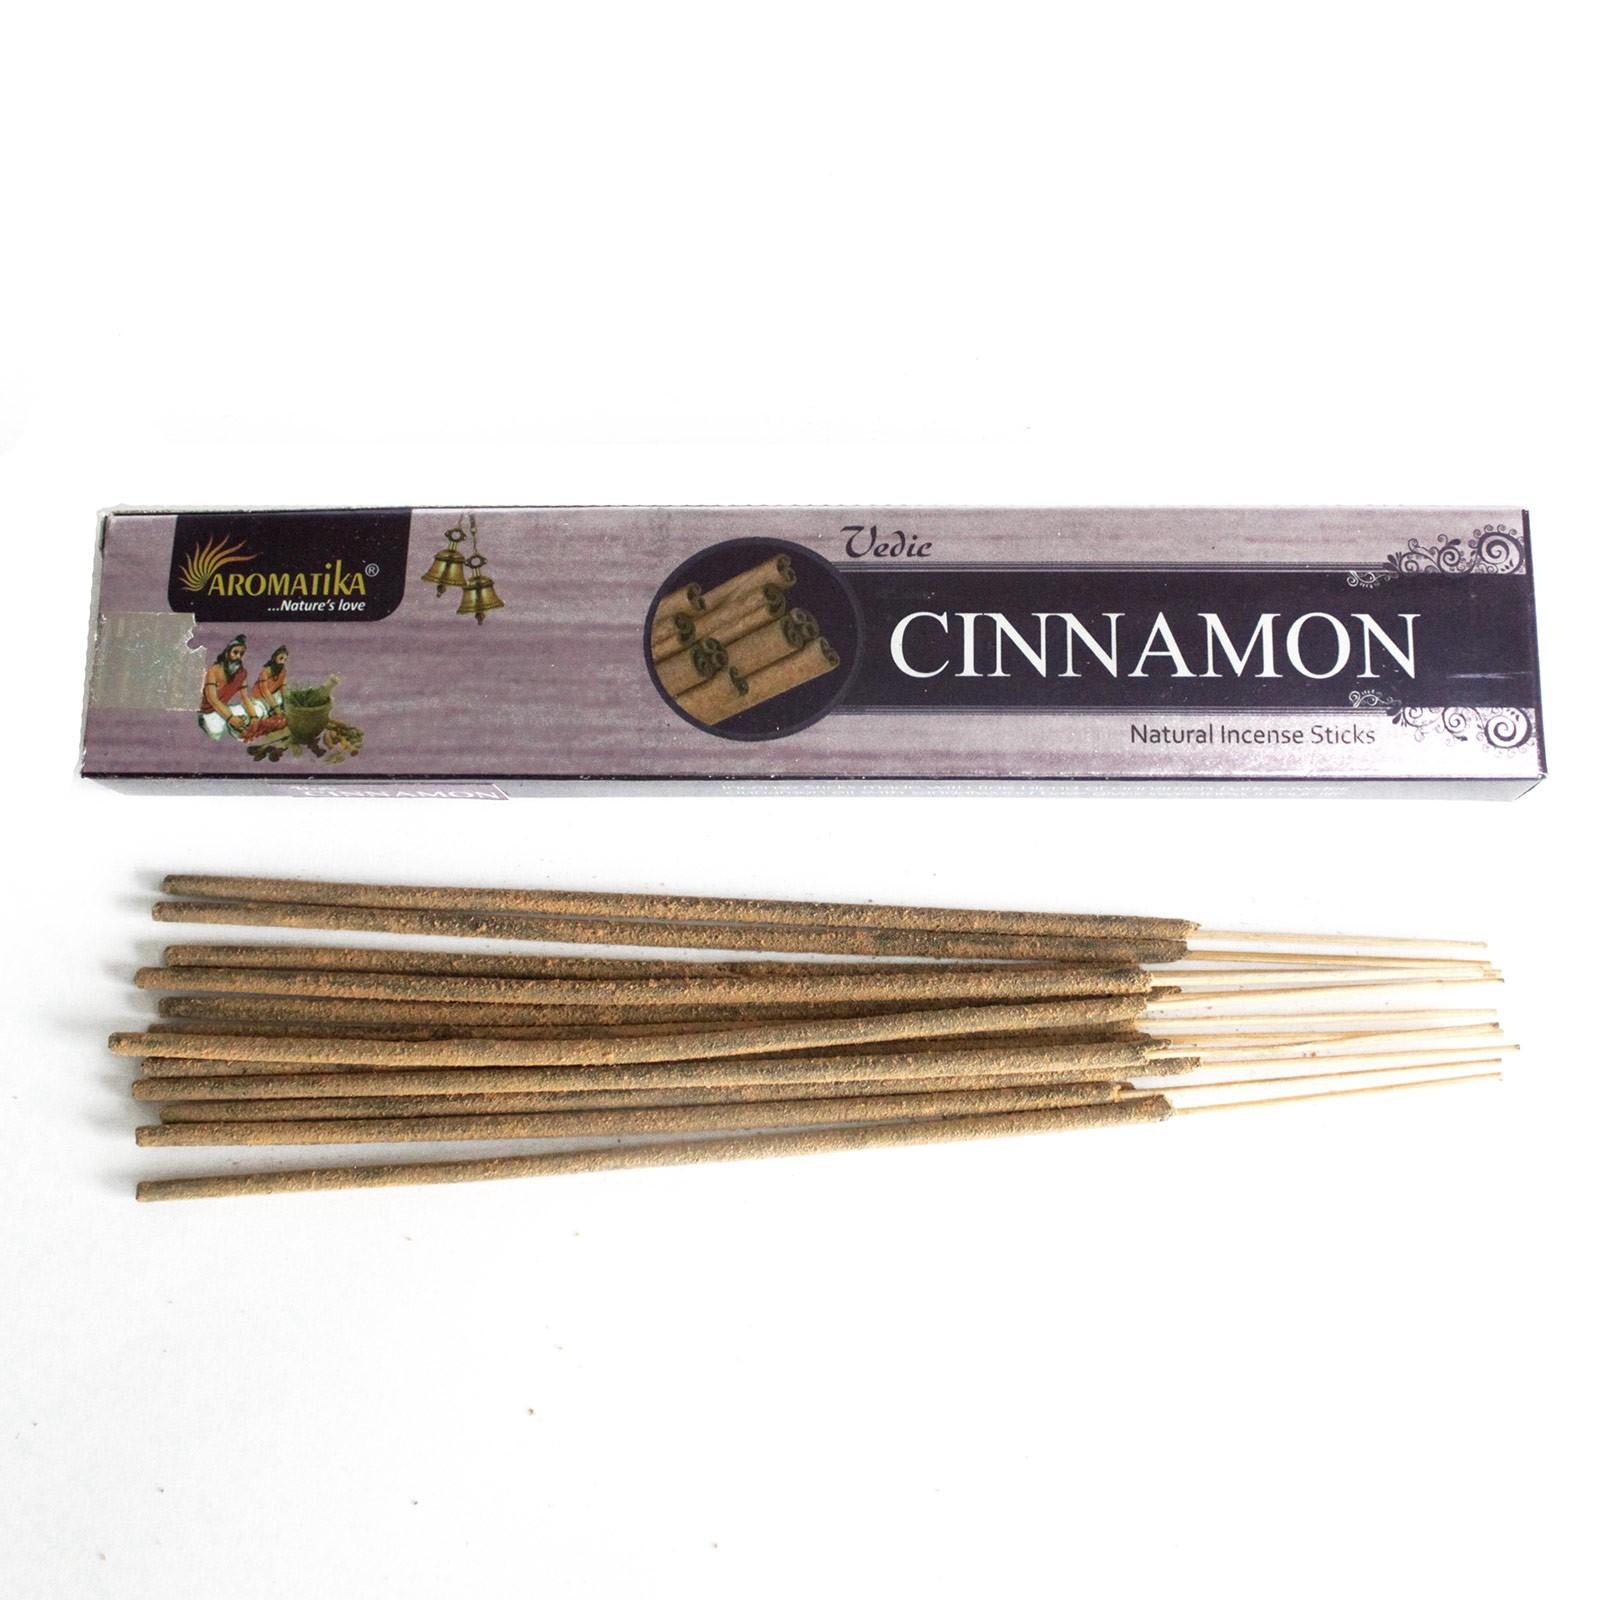 Vedic -Incense Sticks - Cinnamon